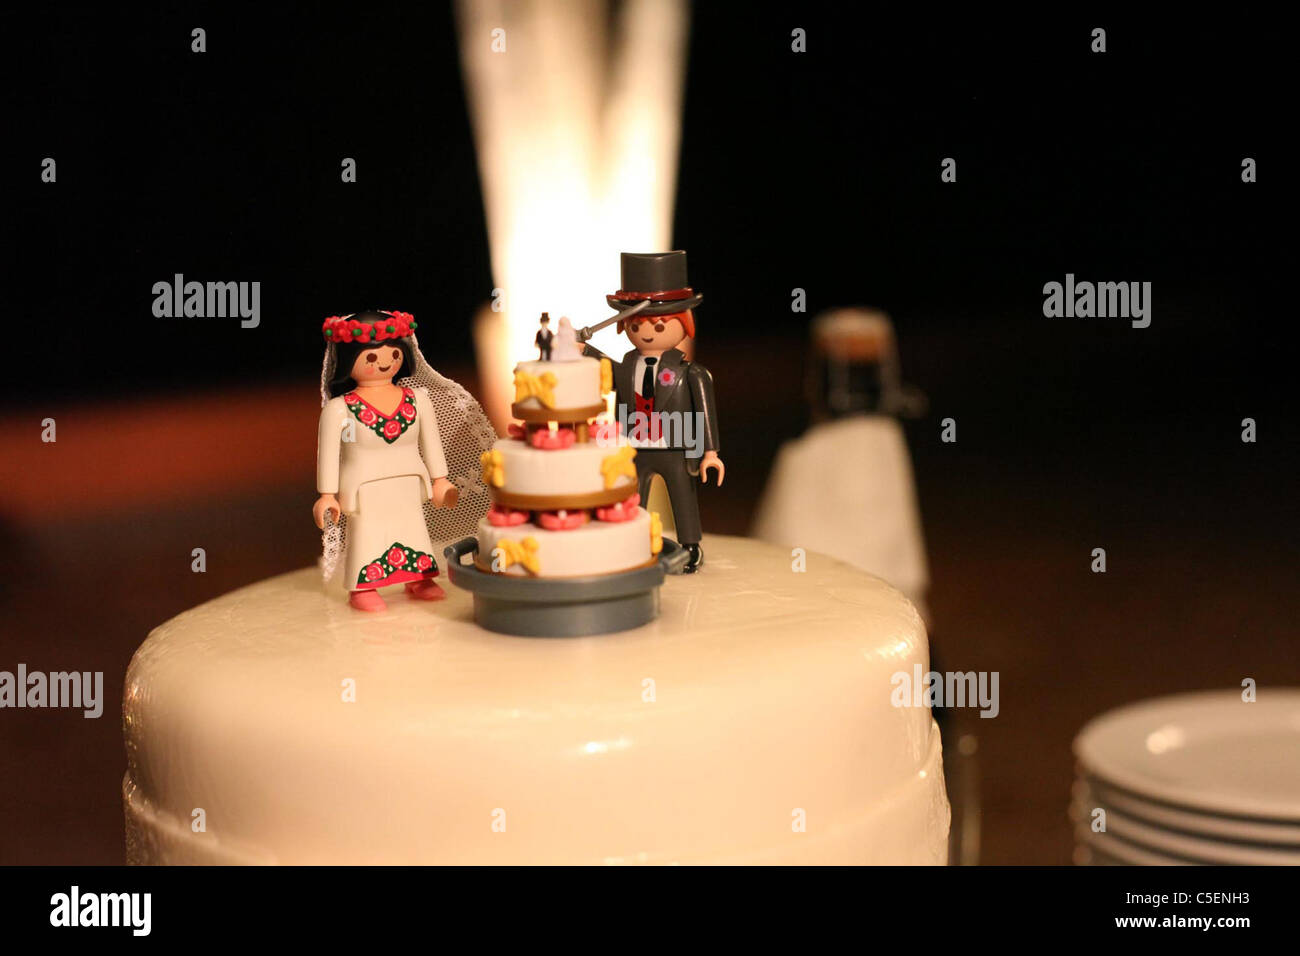 Lego Hochzeitstorte Oben Stockfoto Bild 37818287 Alamy